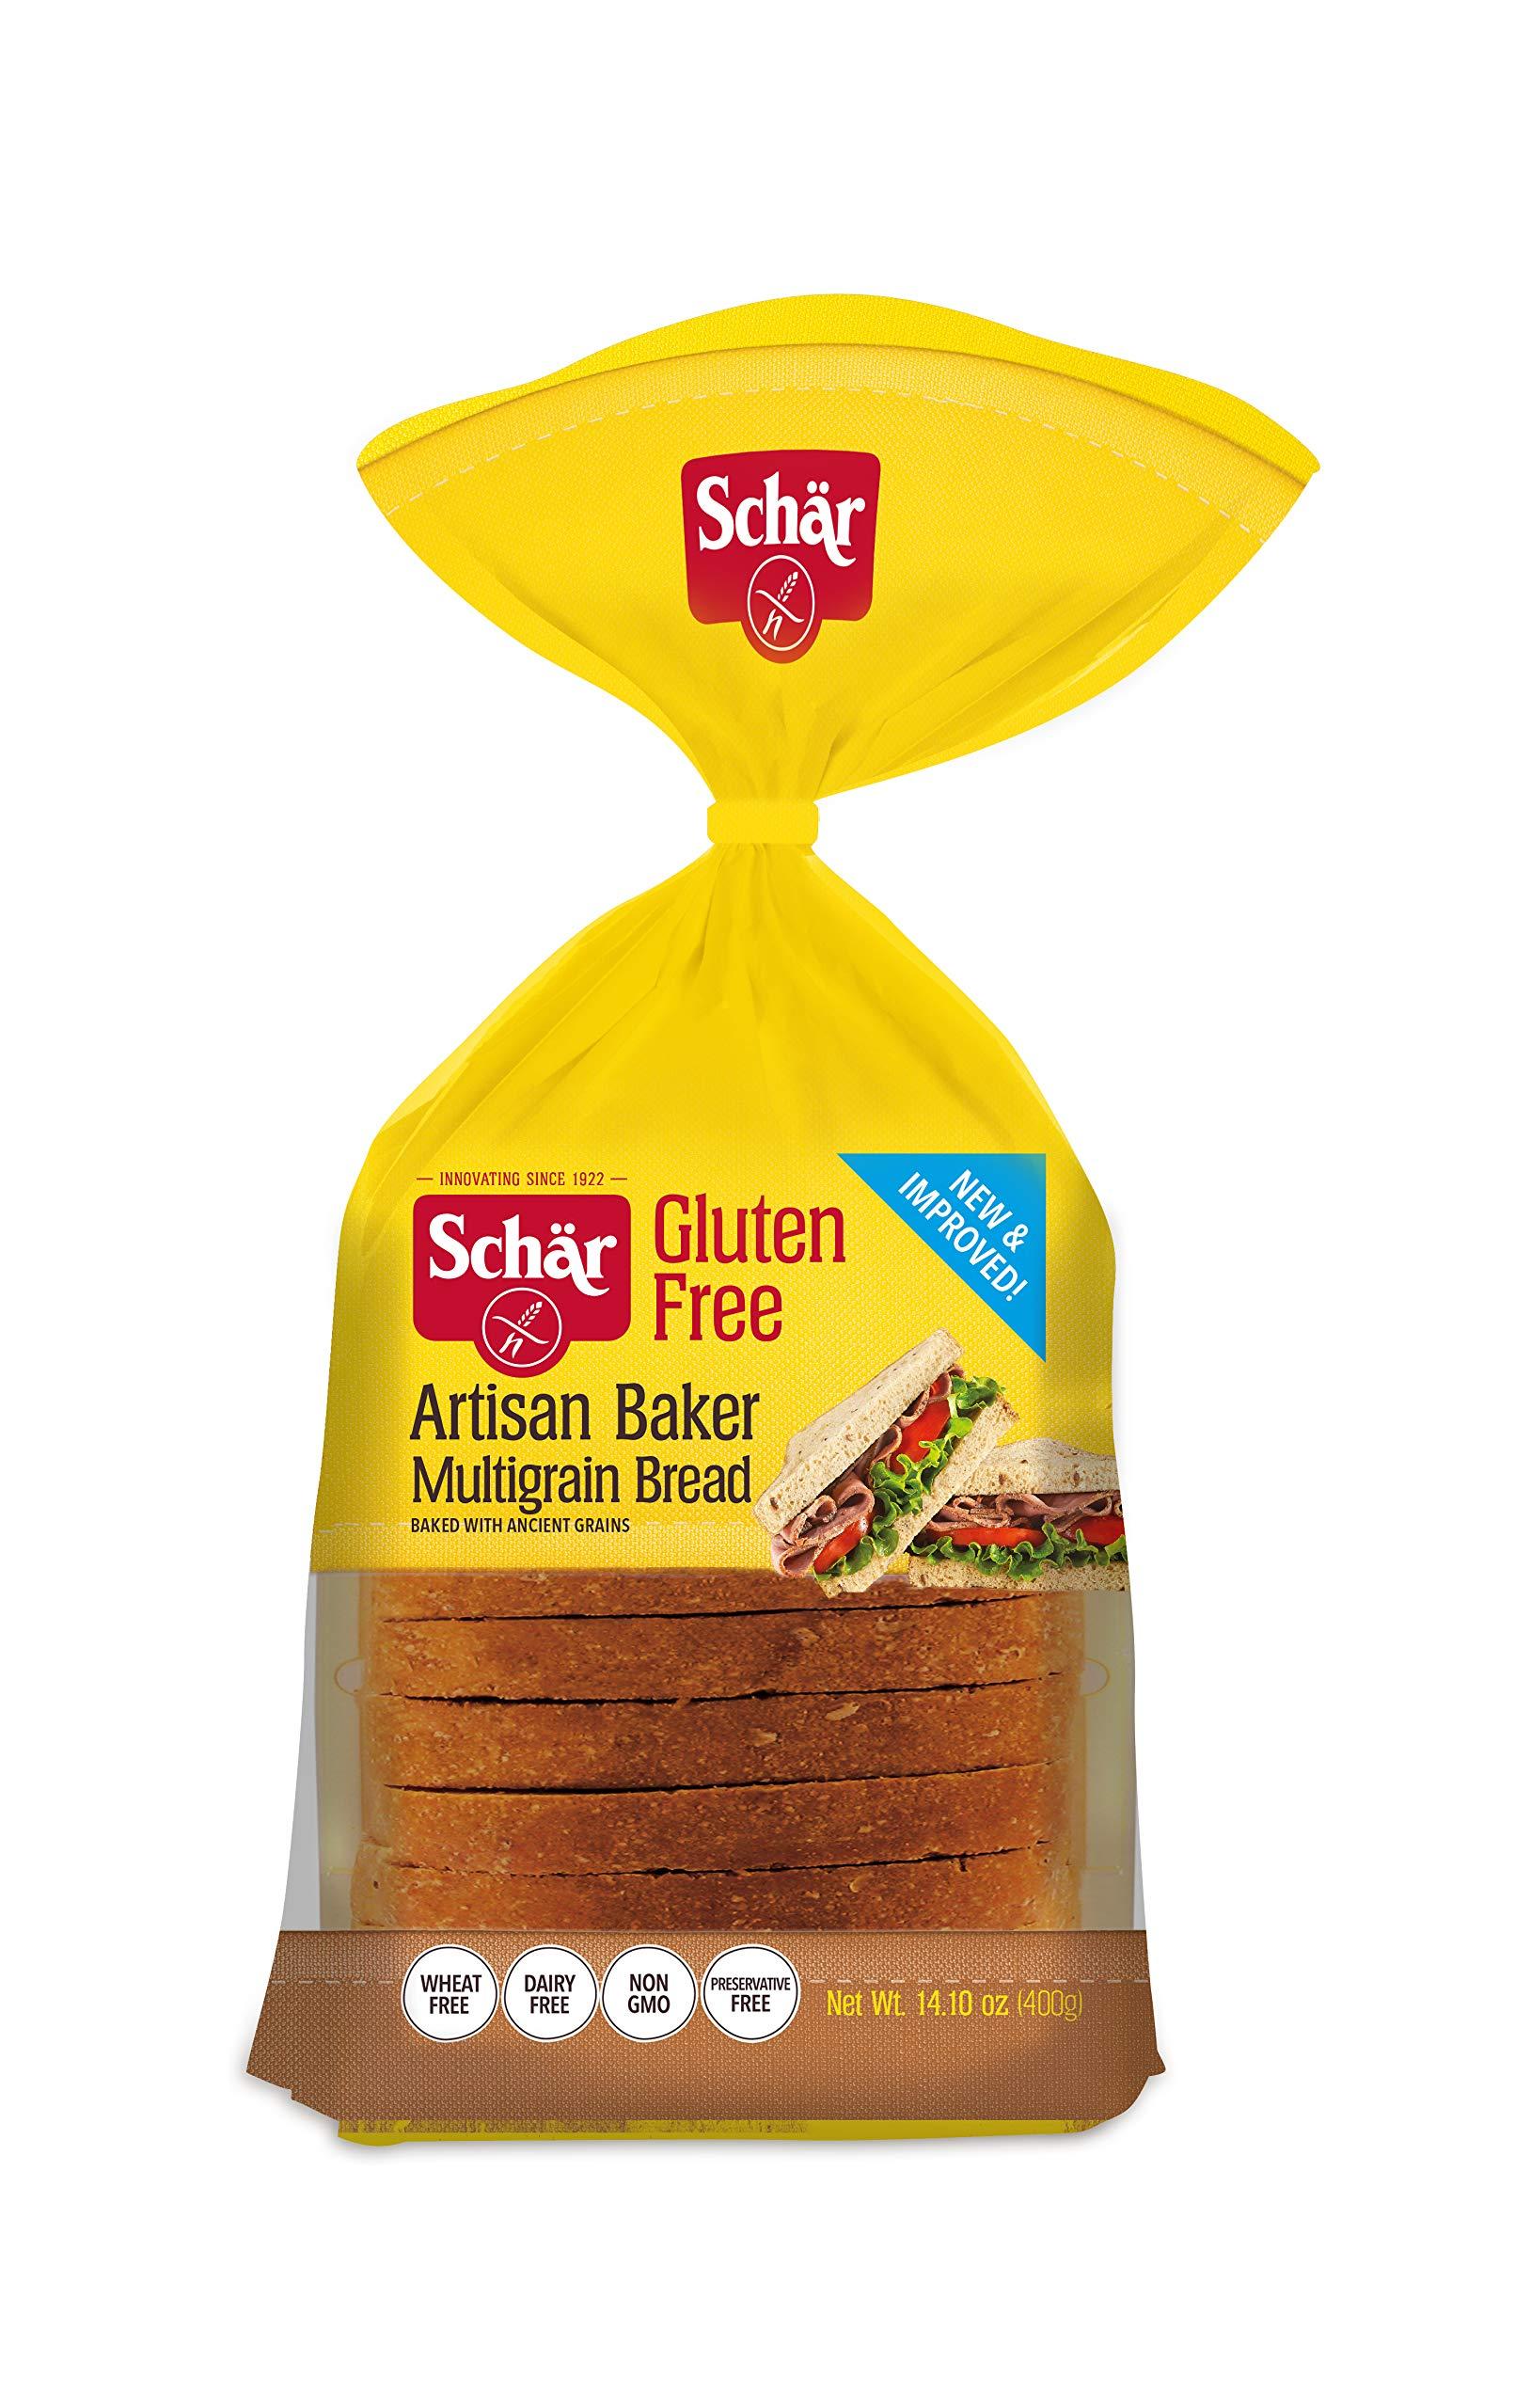 Schär Gluten Free Artisan Baker Multigrain Bread, 14.1 oz., 6-Pack by Schar